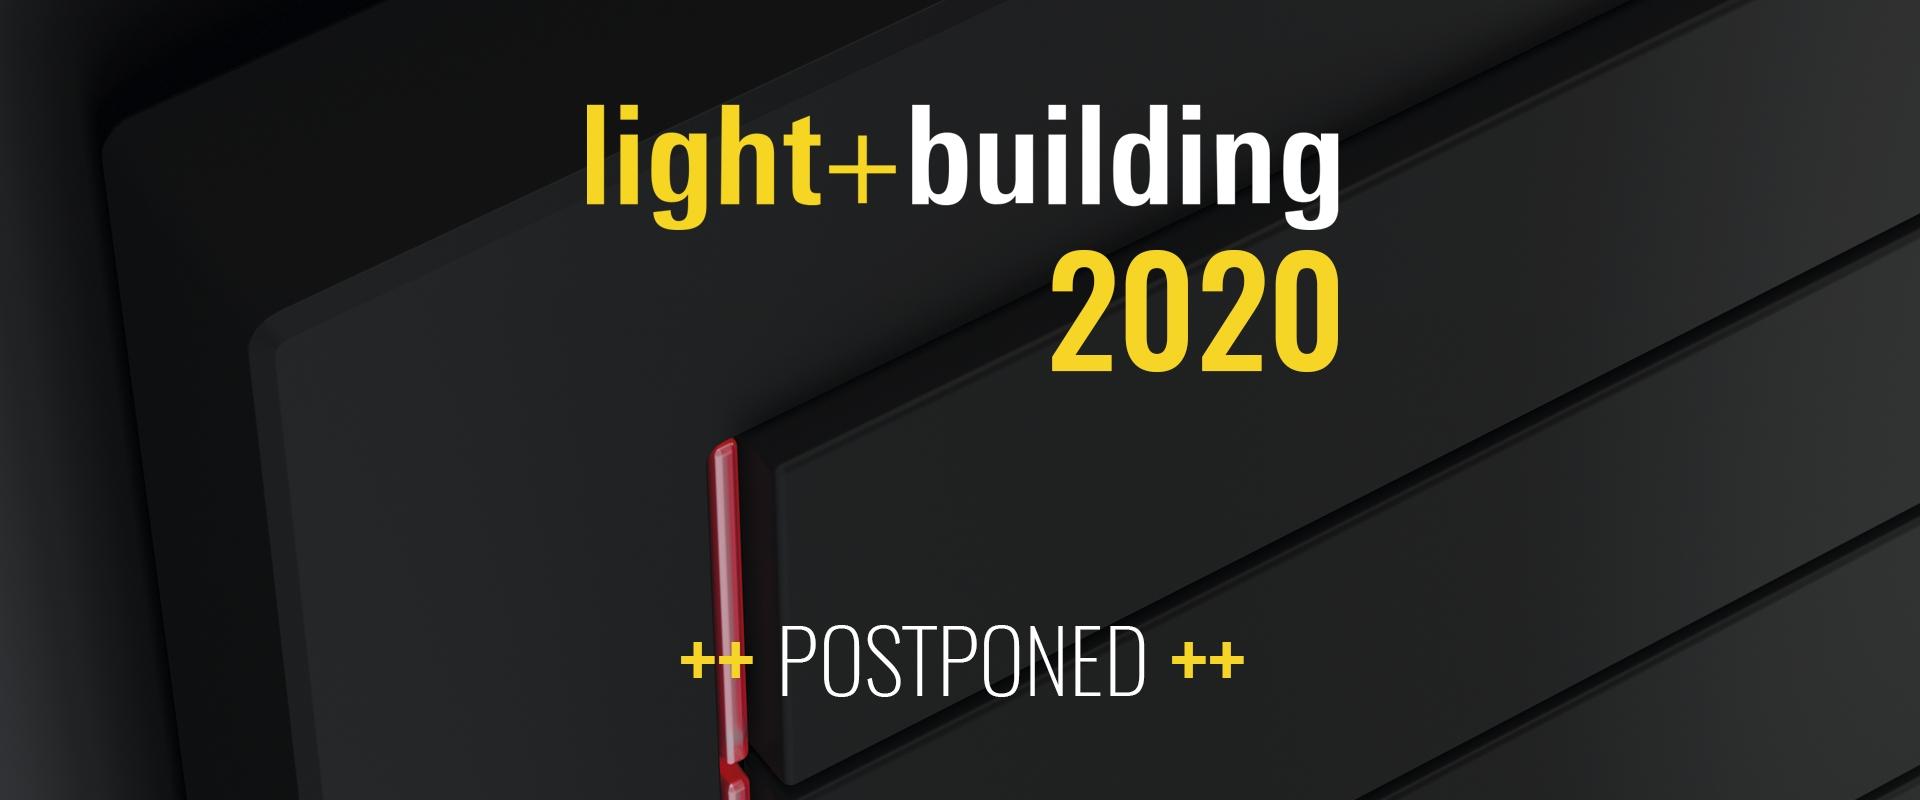 Light+Building - 8-13 Marzo 2020 - Francoforte